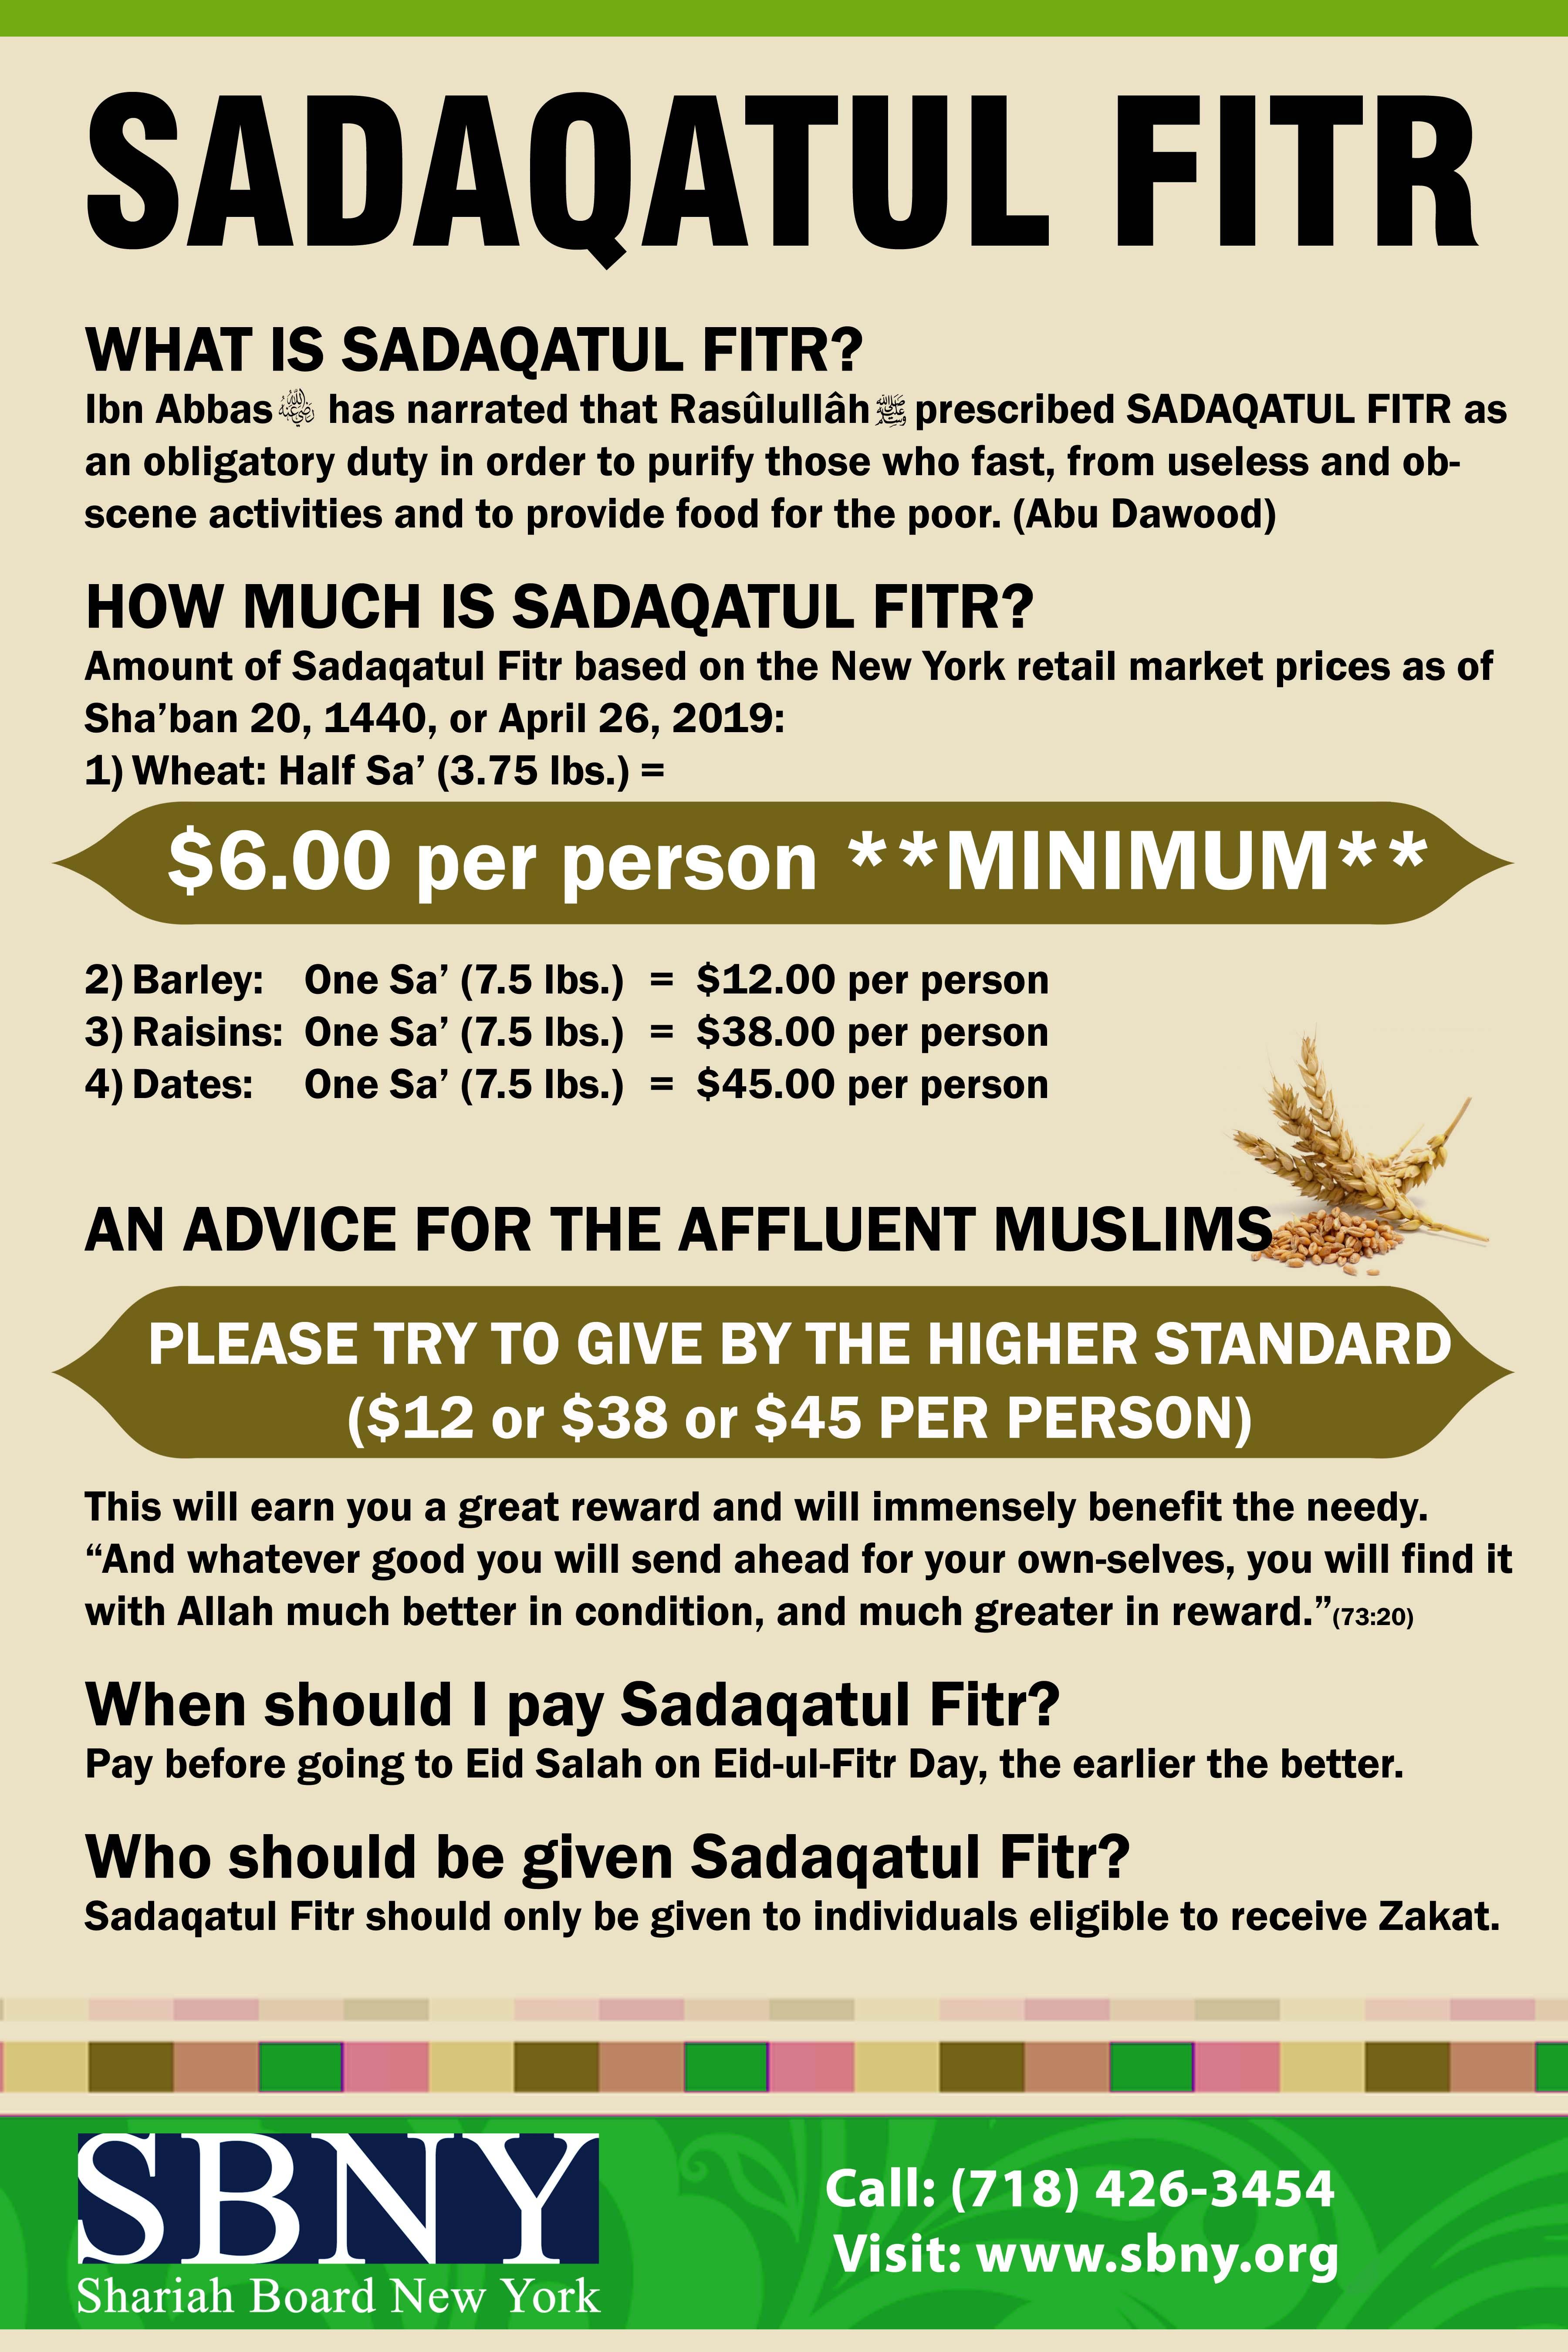 SADAQATUL FITR 2019 Shariah Board New York - SBNY